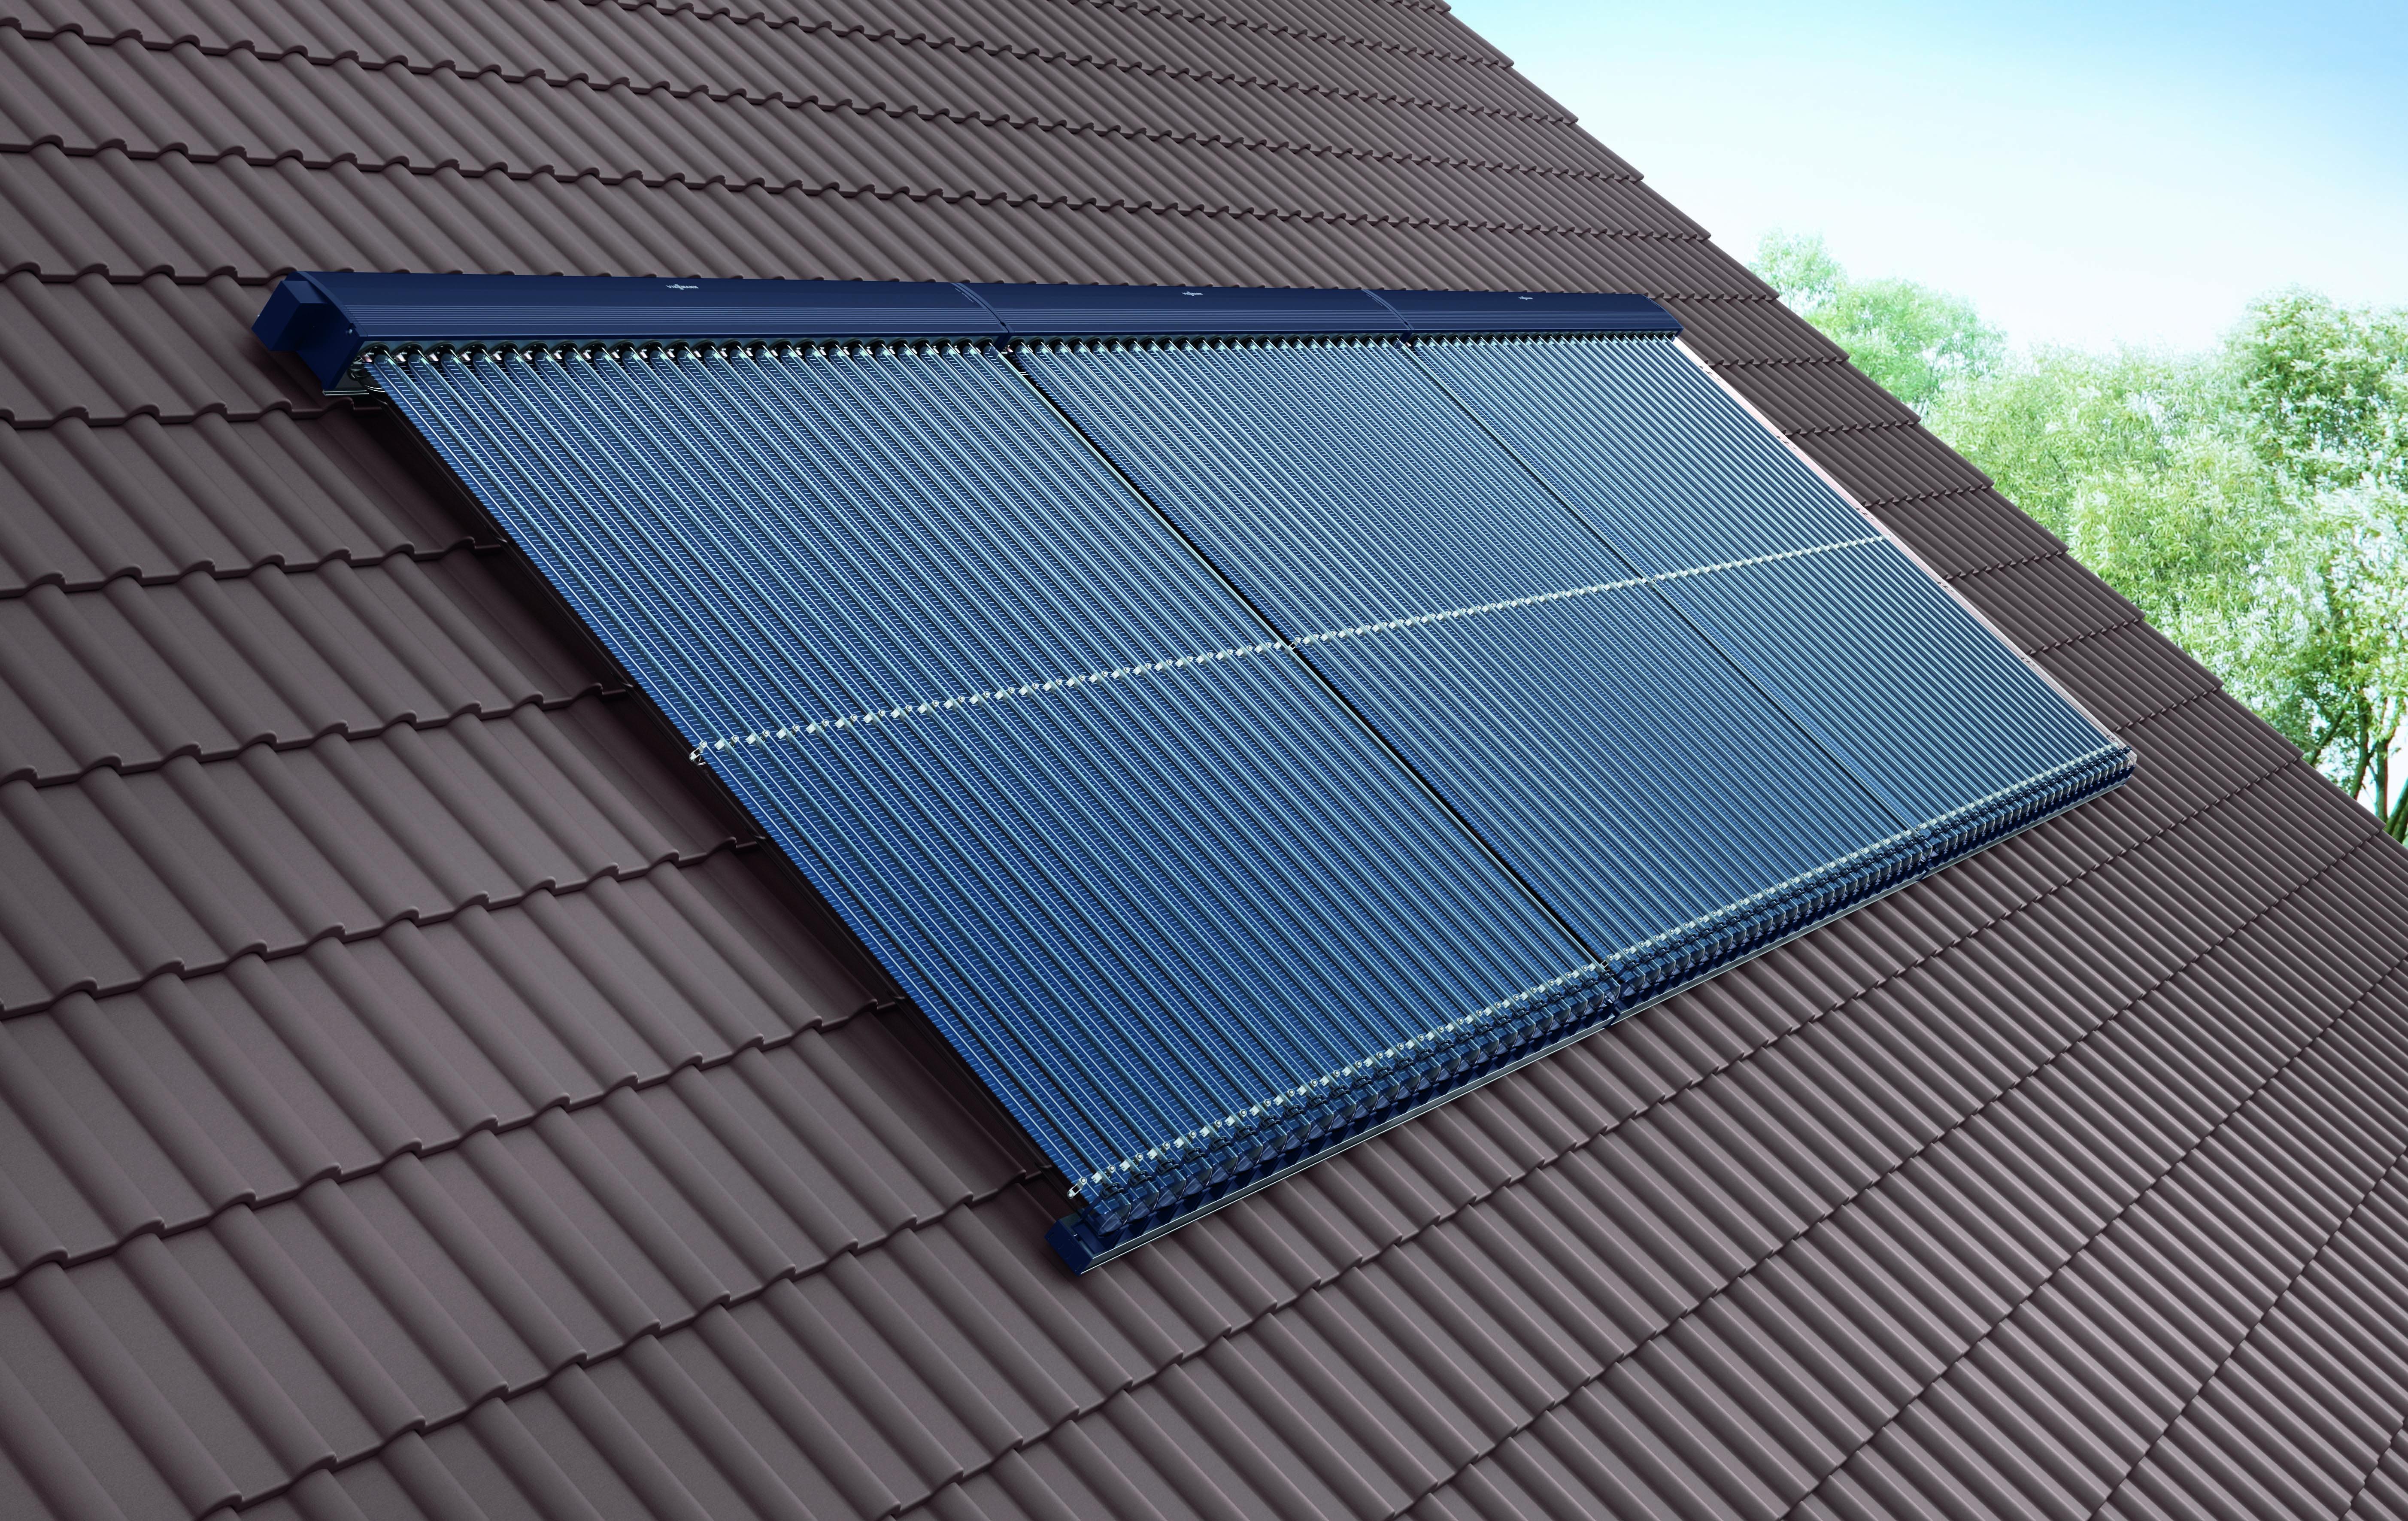 energyinitiative sp cialiste en installation solaire thermique. Black Bedroom Furniture Sets. Home Design Ideas